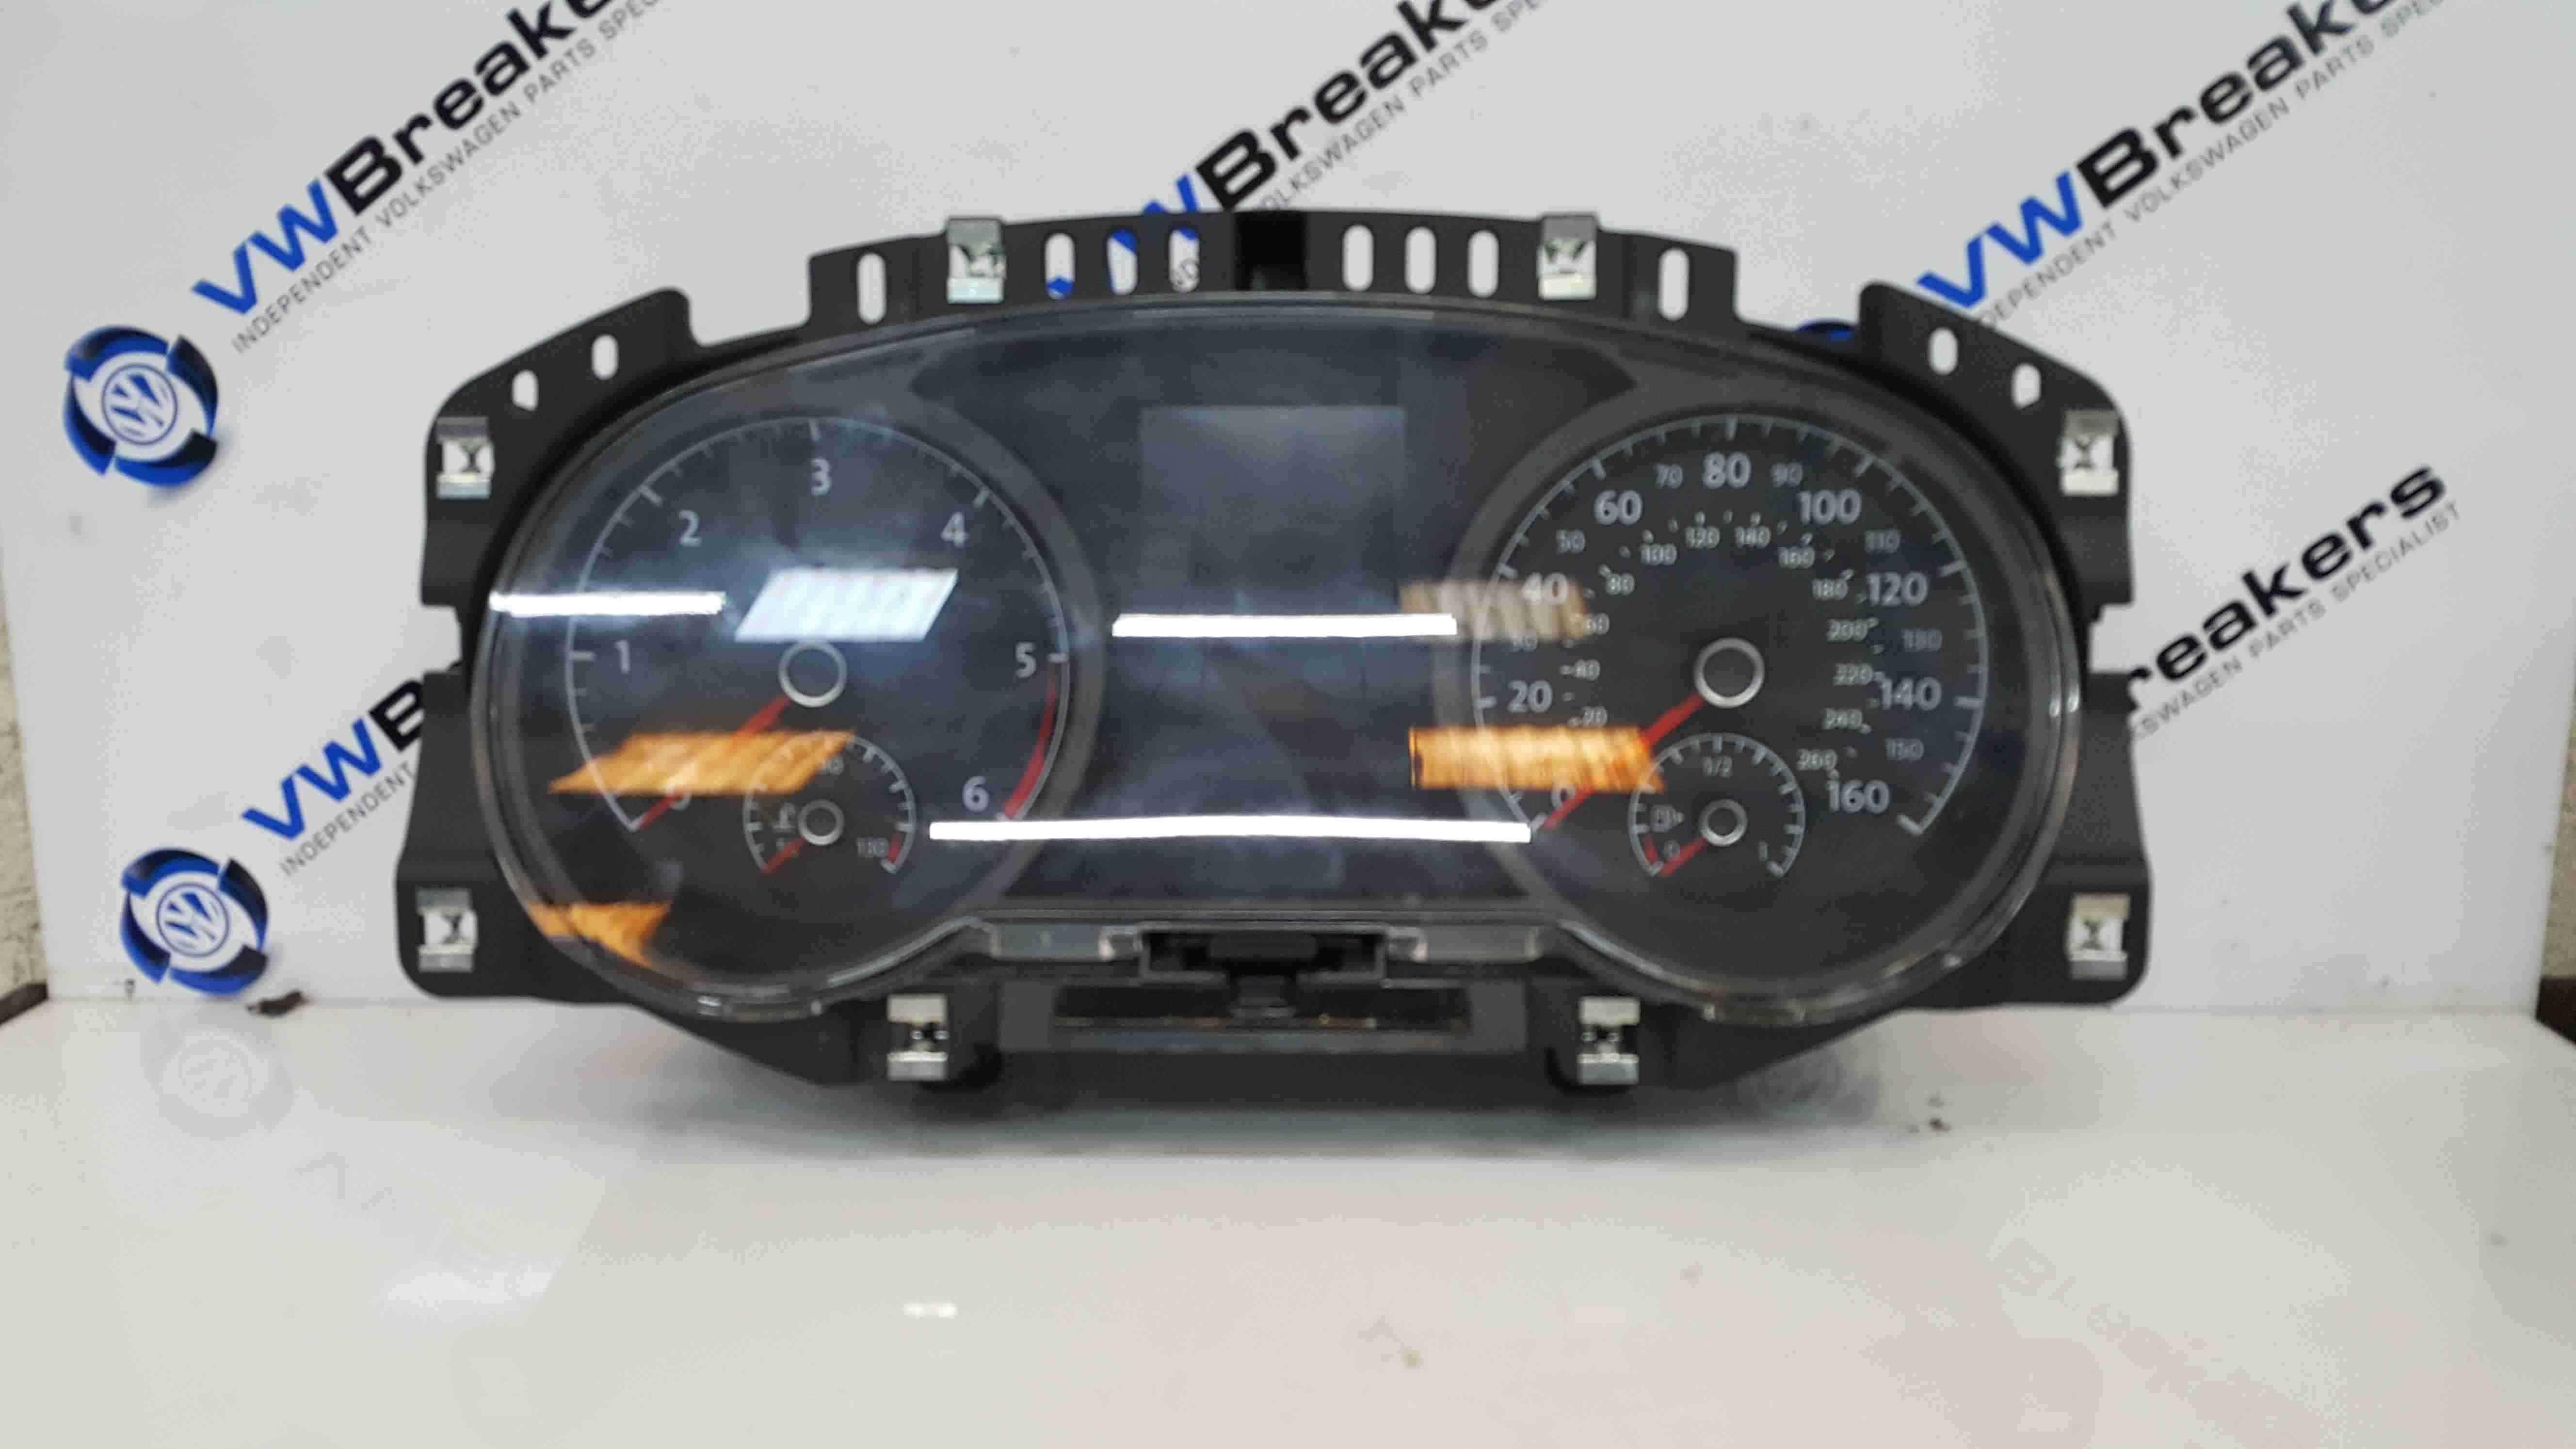 Volkswagen Golf MK7 2012-2017 Instrument Panel Dials Clocks Cluster 5G1920941